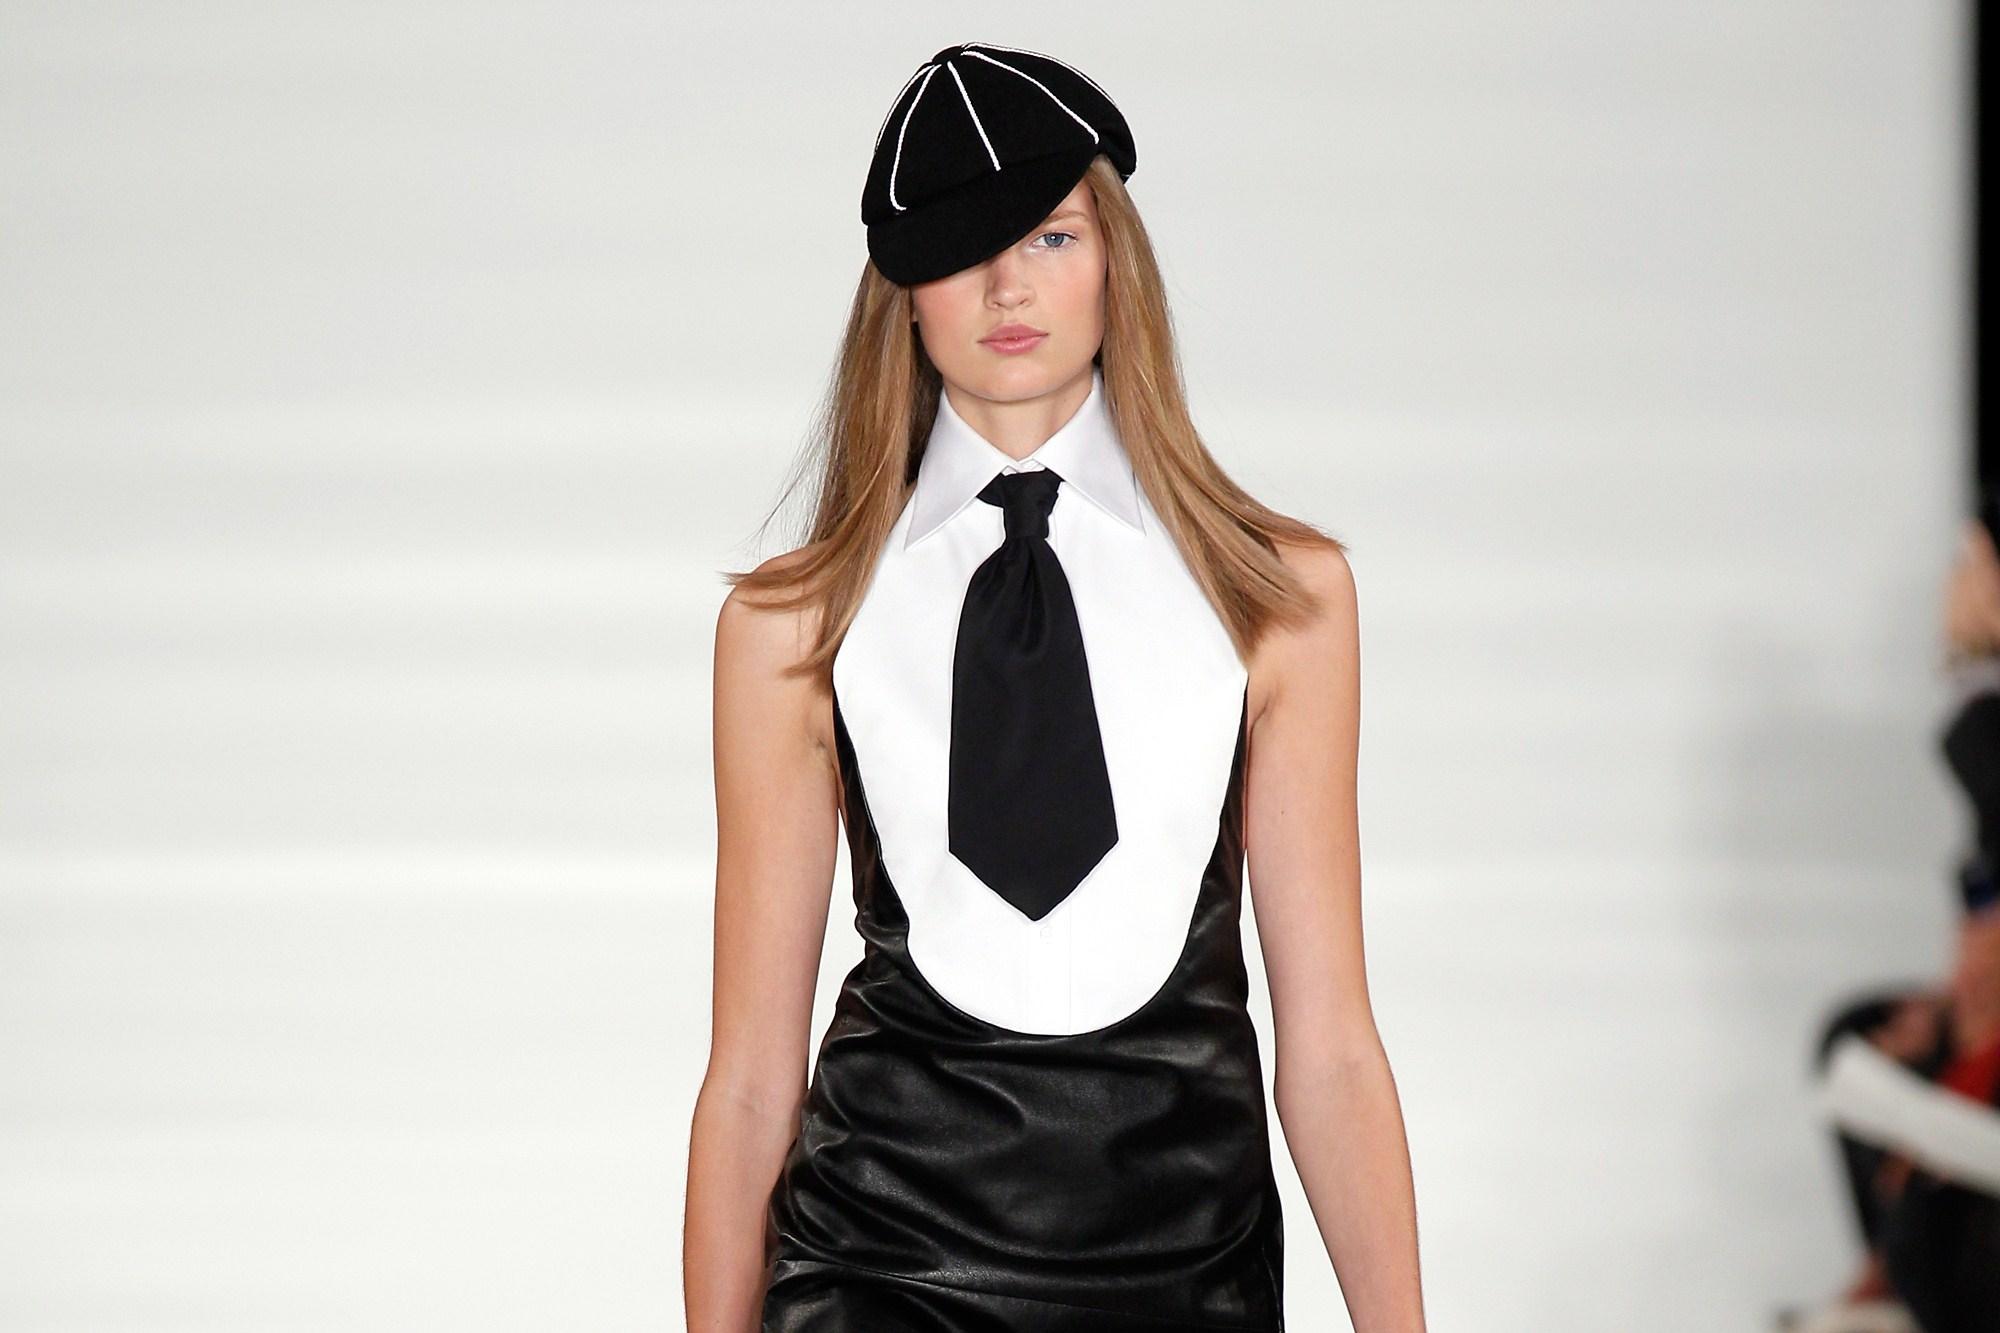 Ralph Lauren porta in passerella collegiali e femme fatale (FOTO)